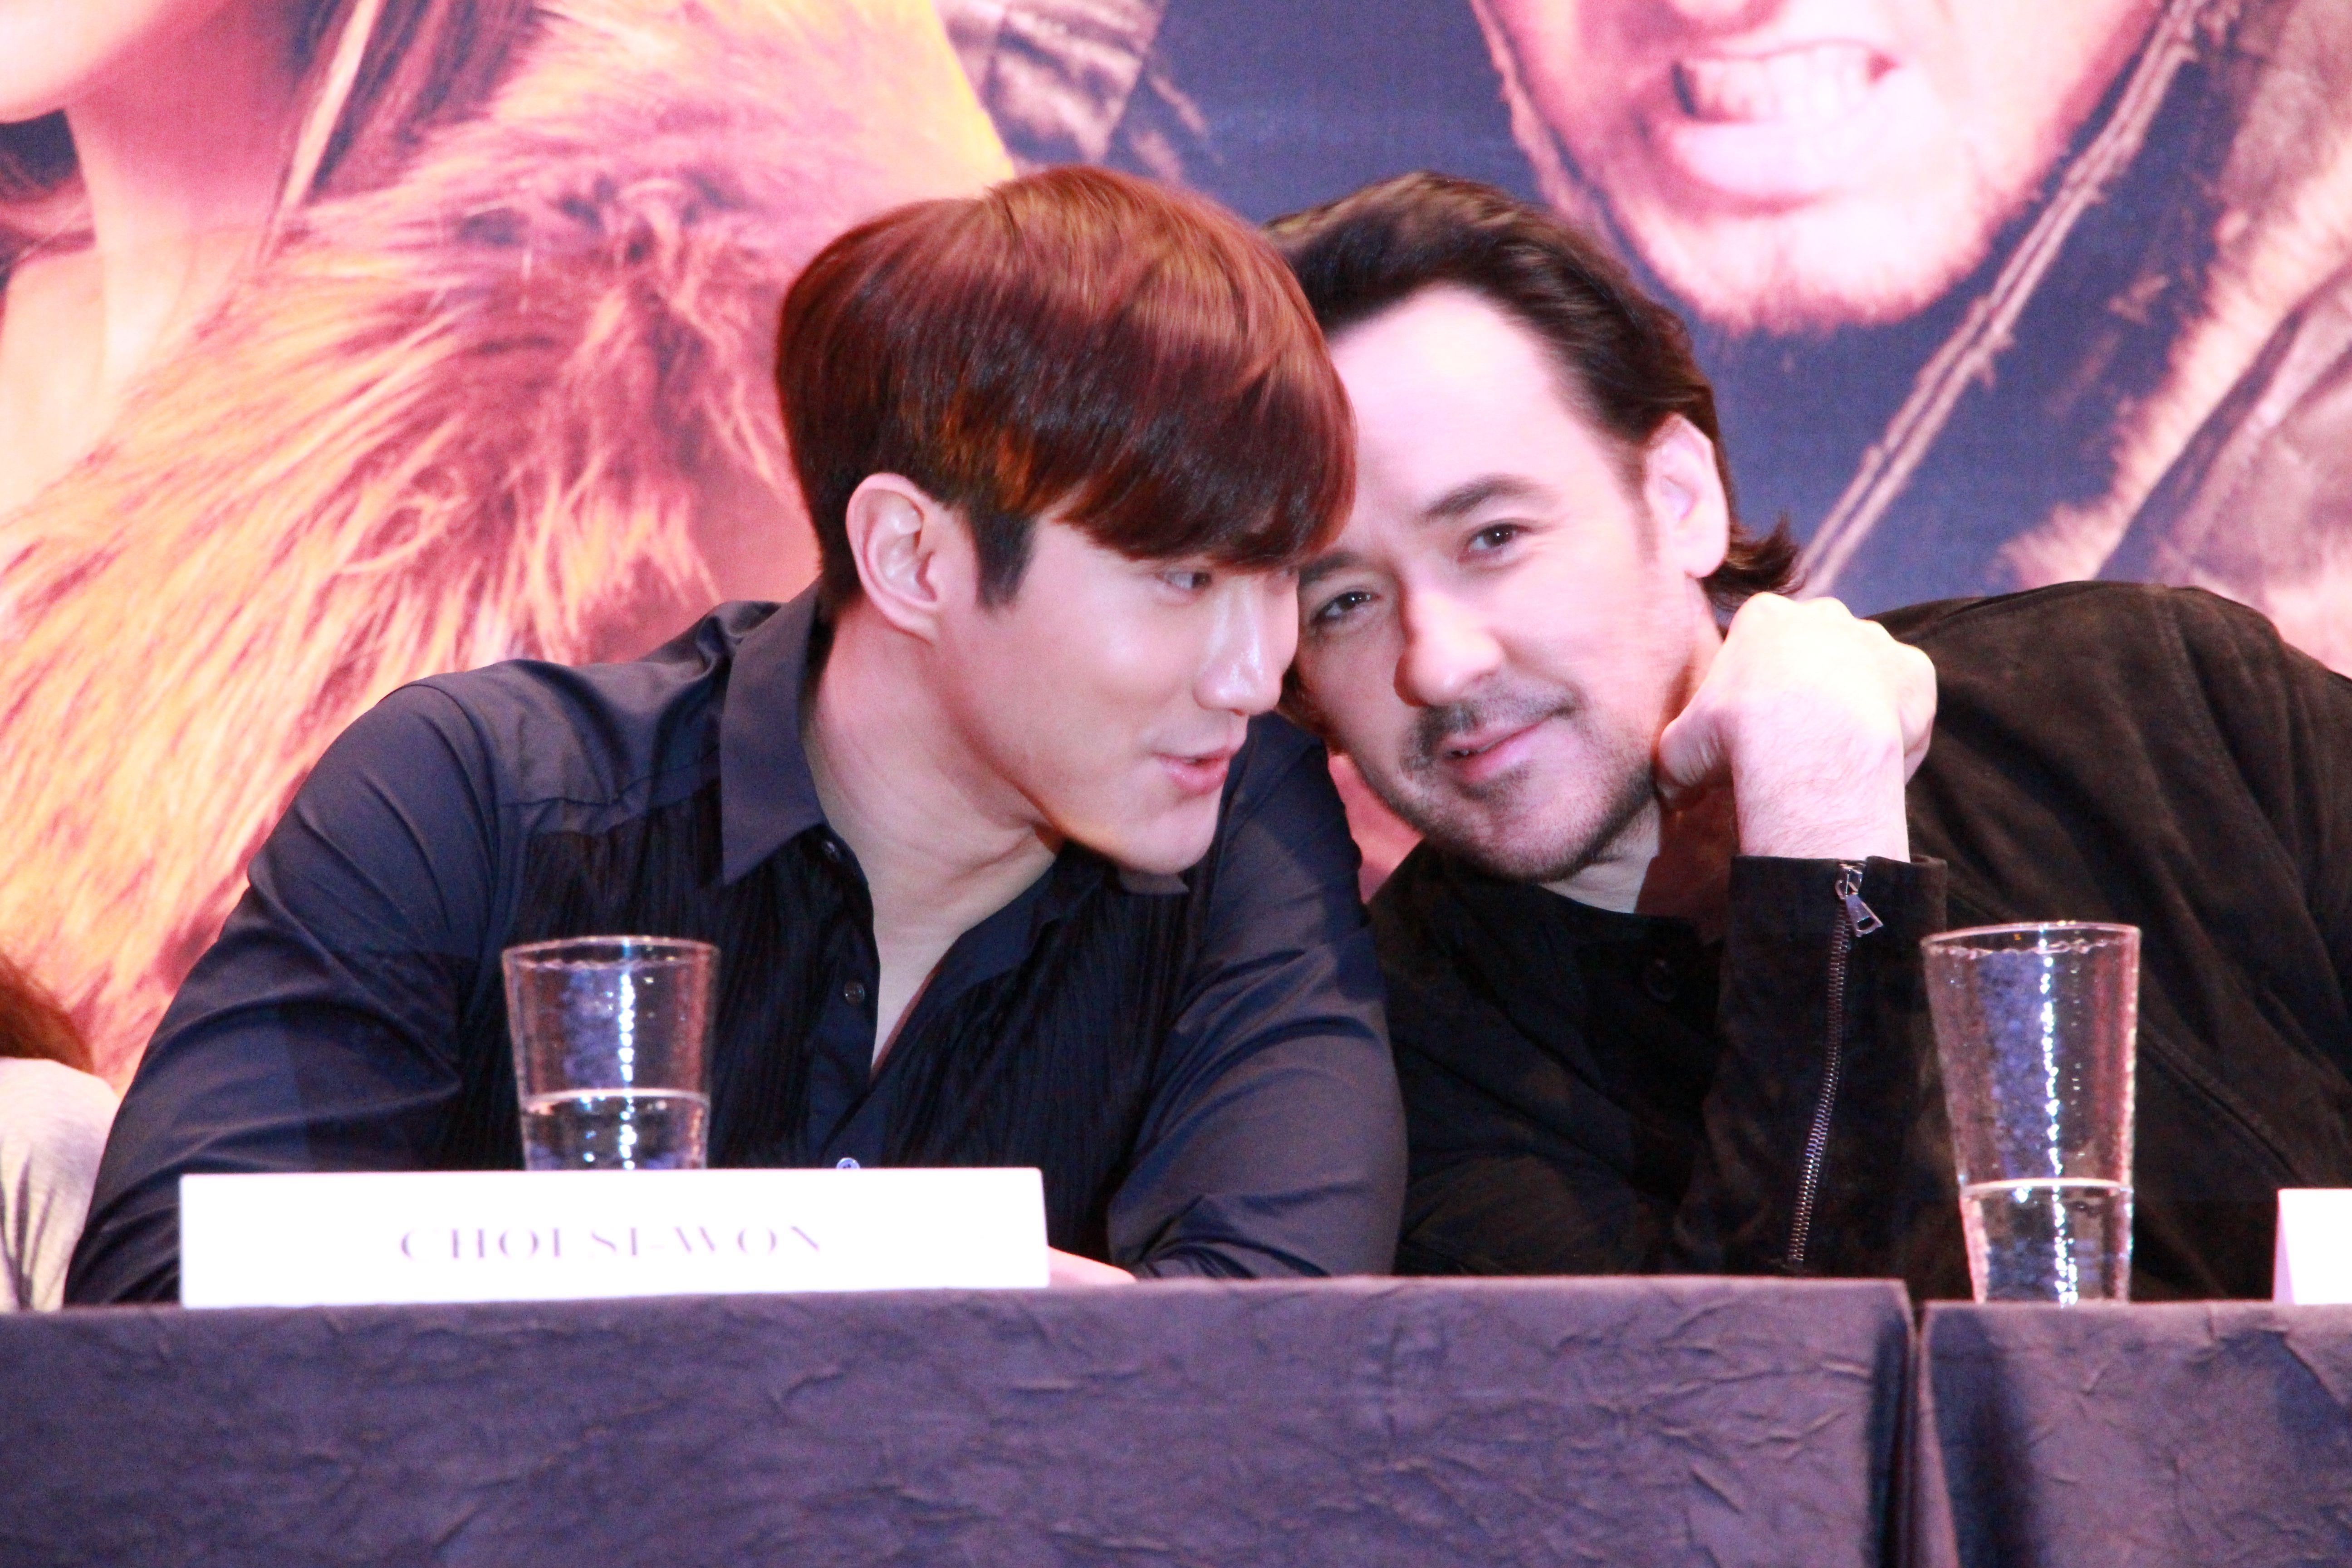 Choi Siwon and John Cusack